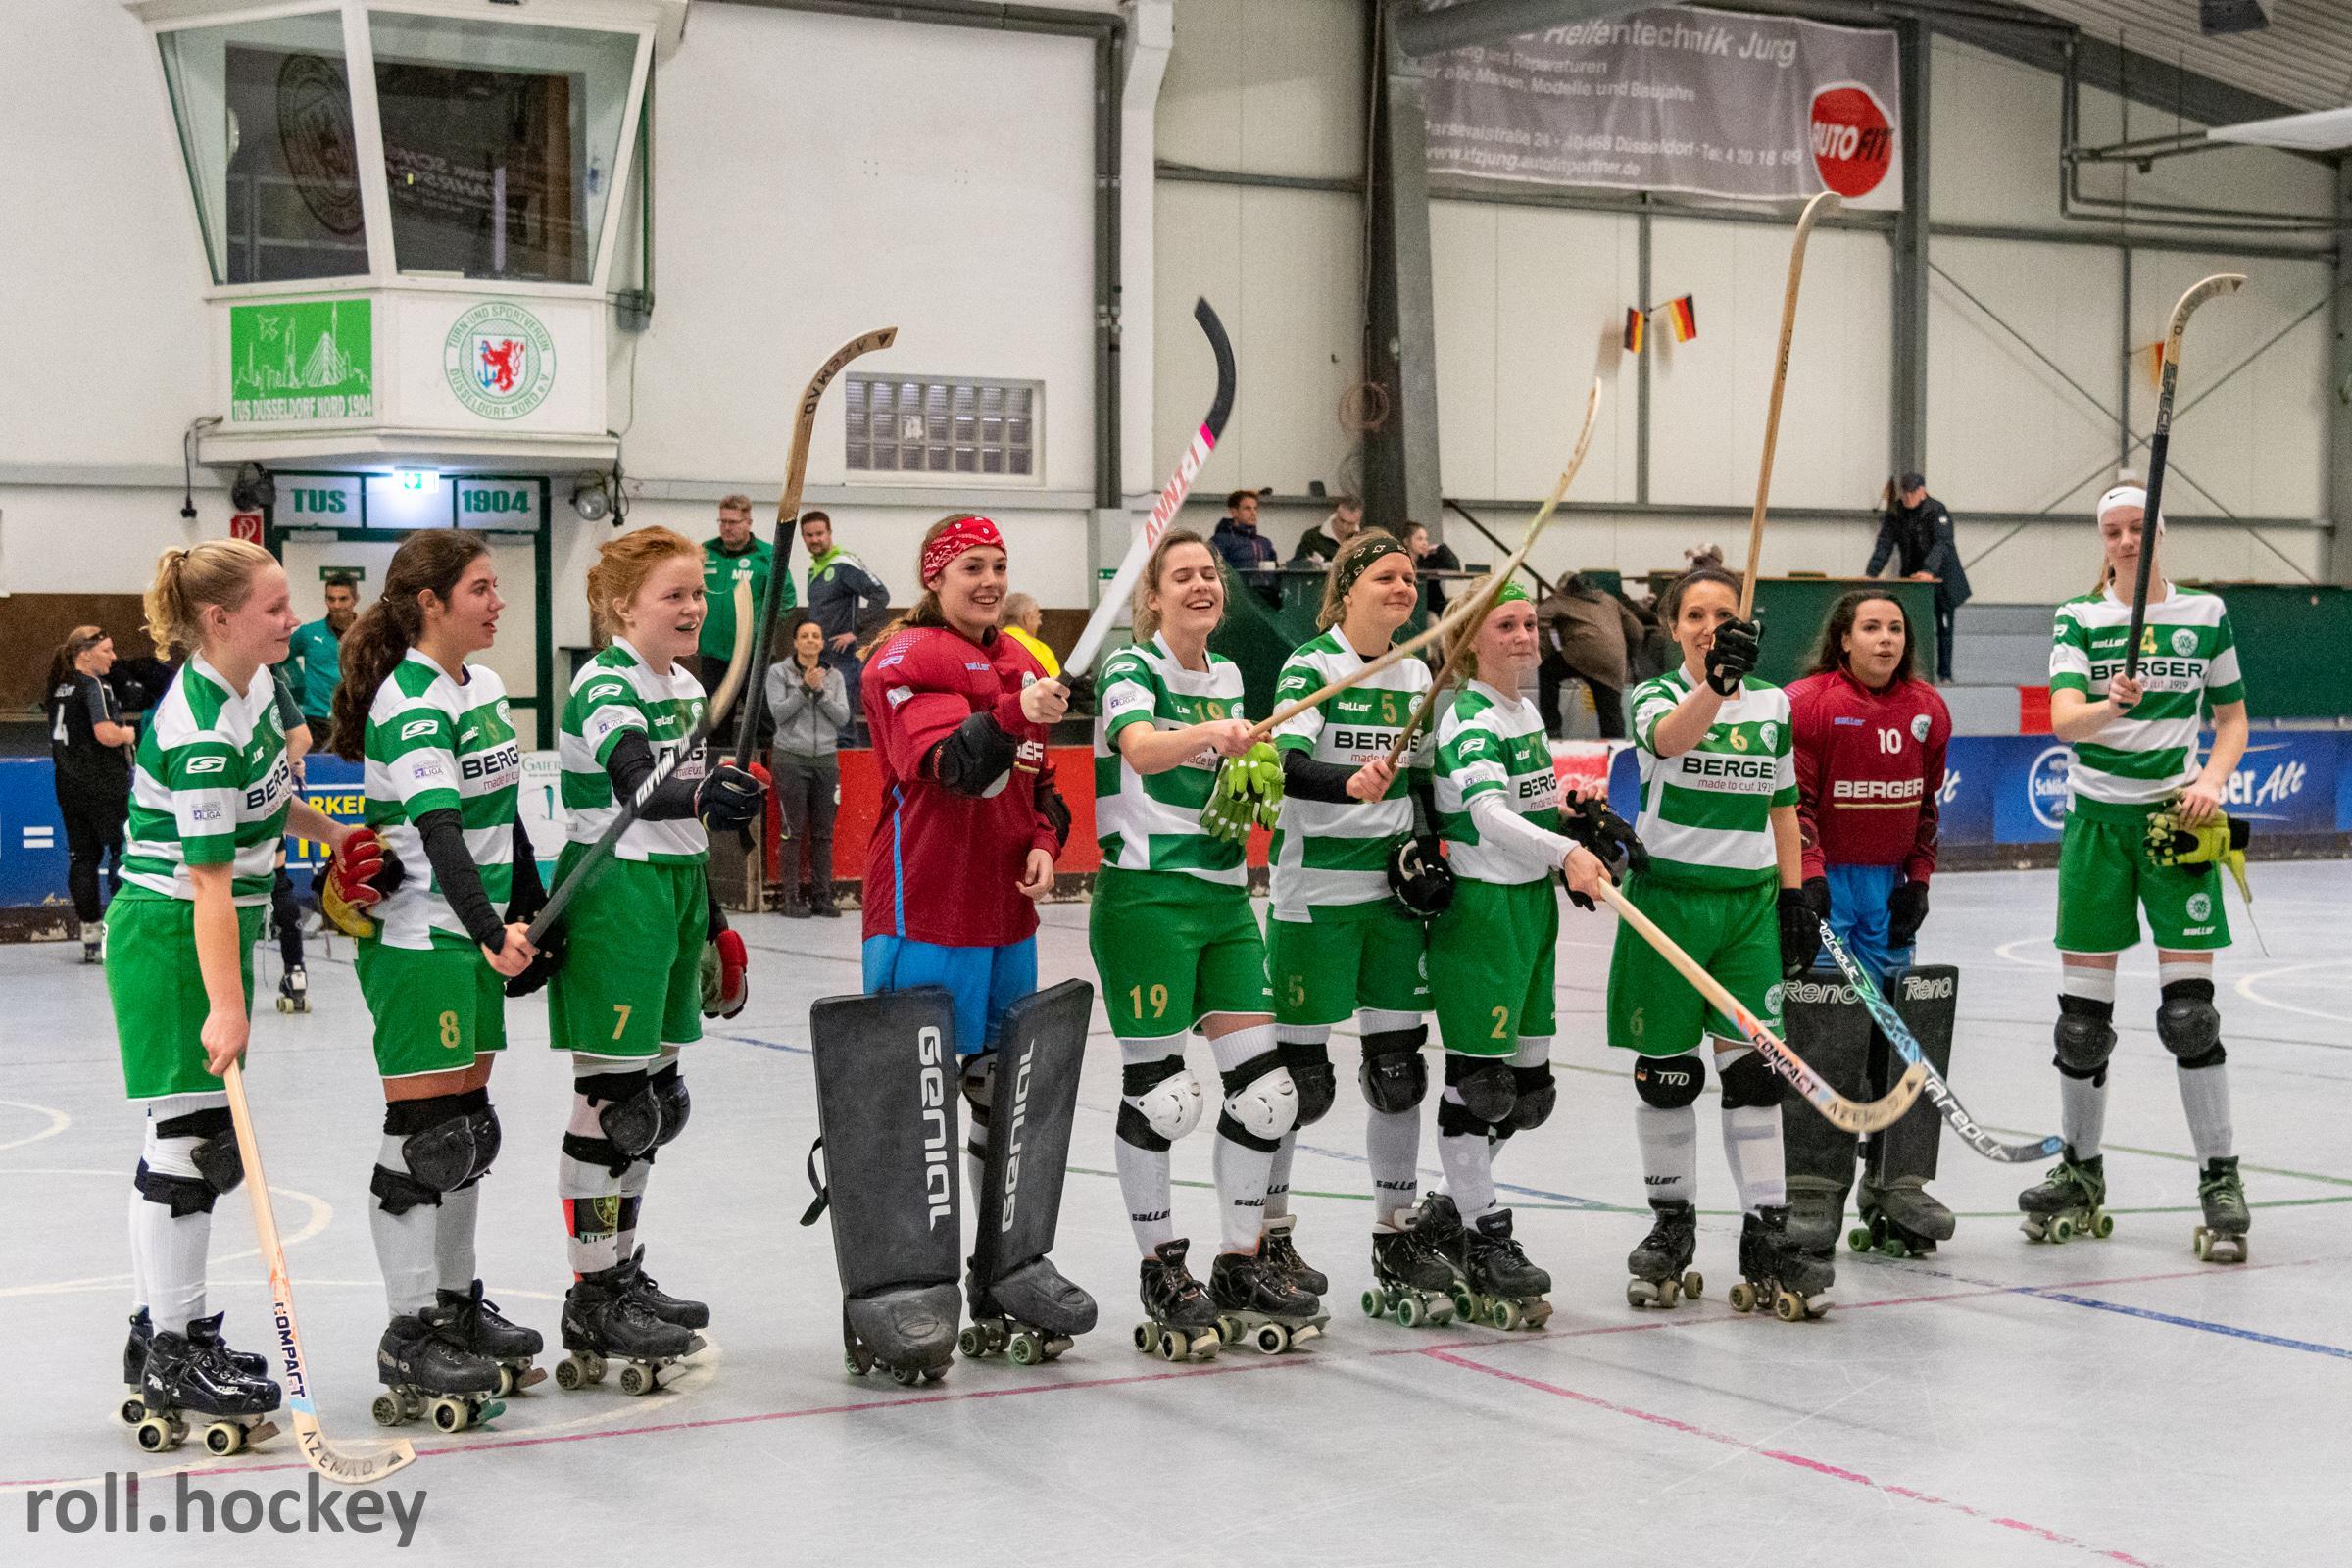 RSC Cronenberg Rollhockey Bundesliga Damen Spieltag 17.11.2019